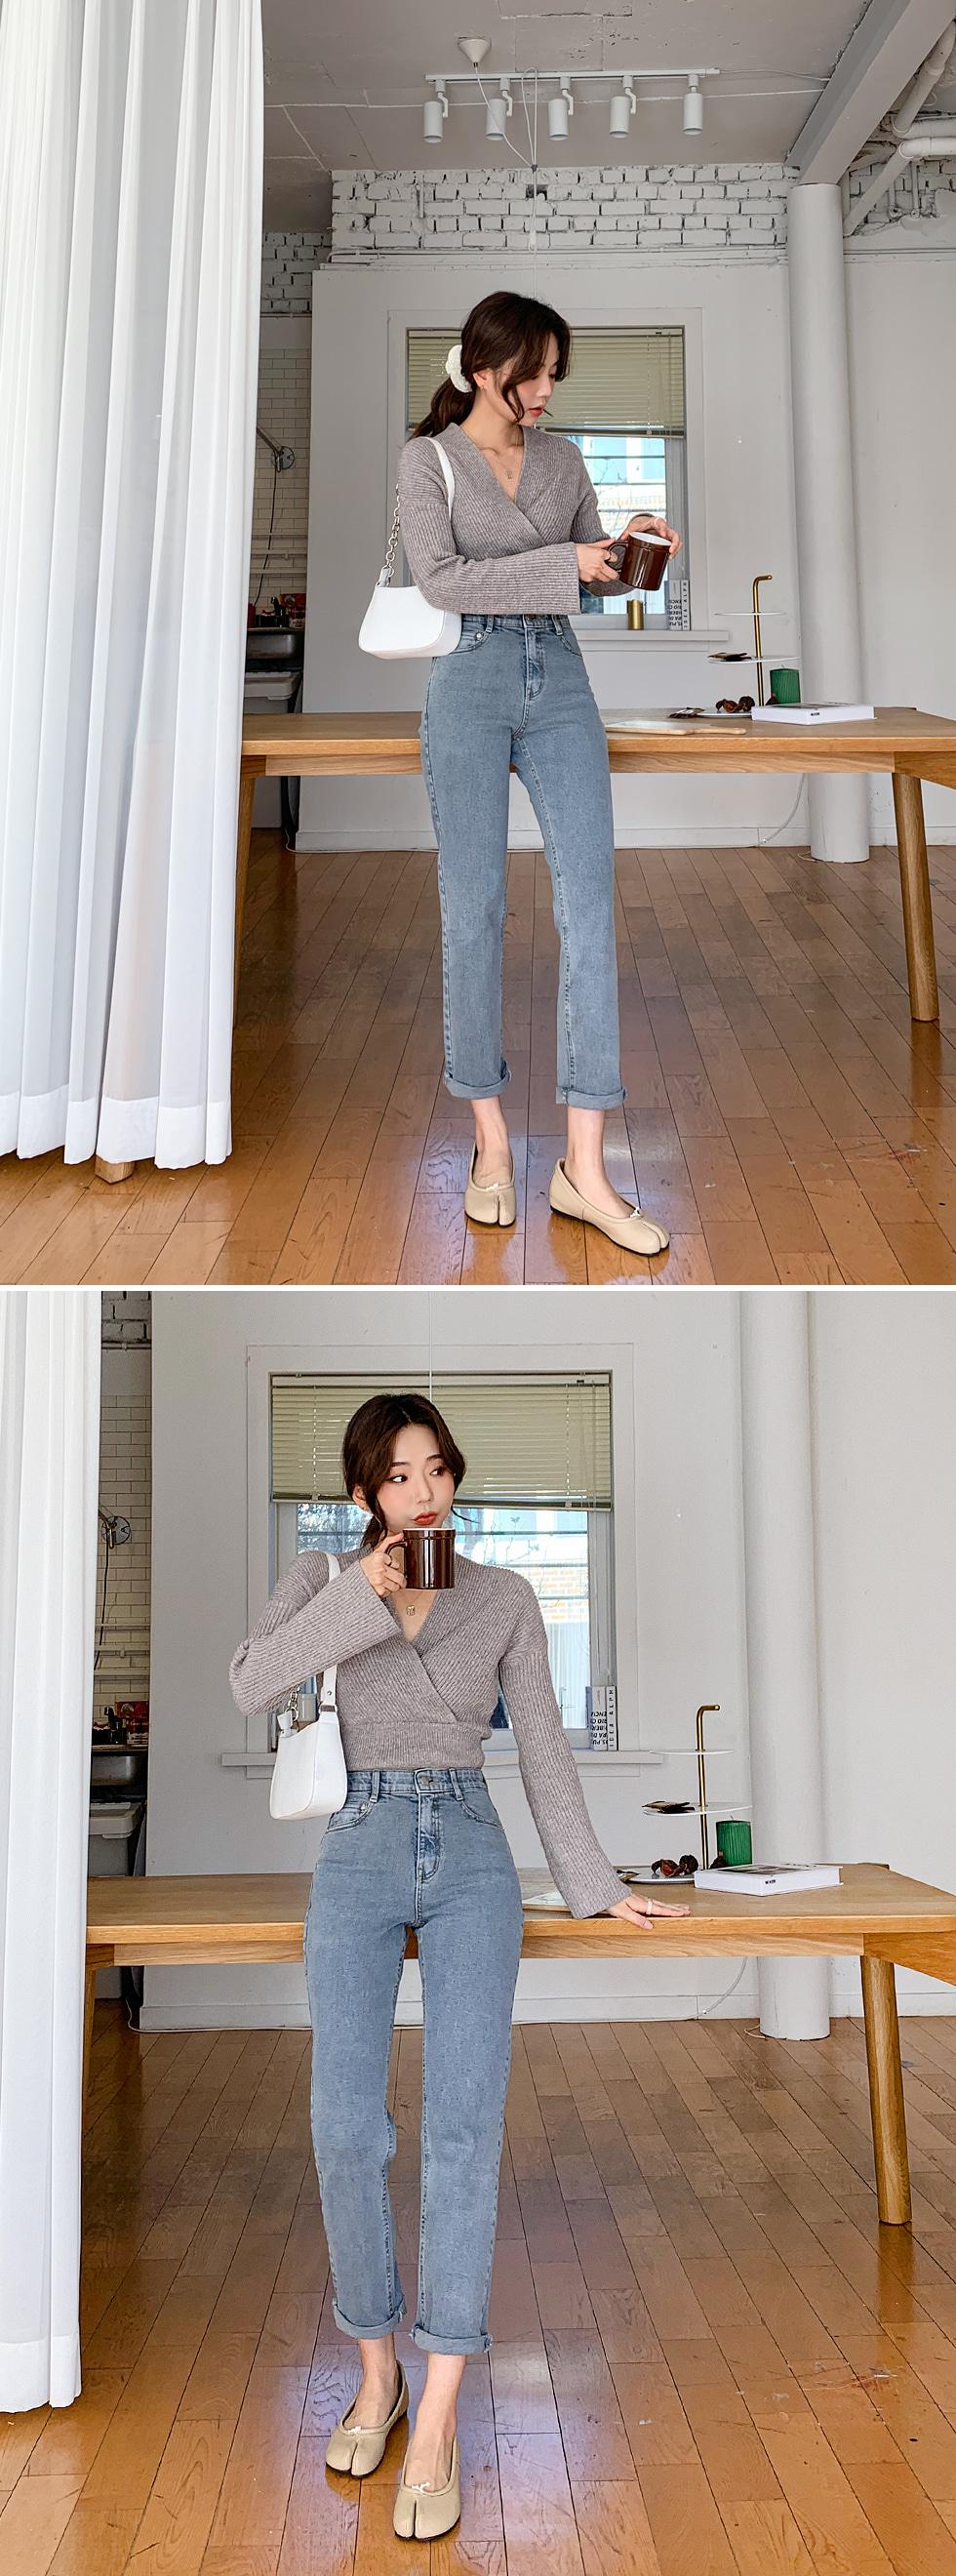 Jenny Cash Lab Knitwear